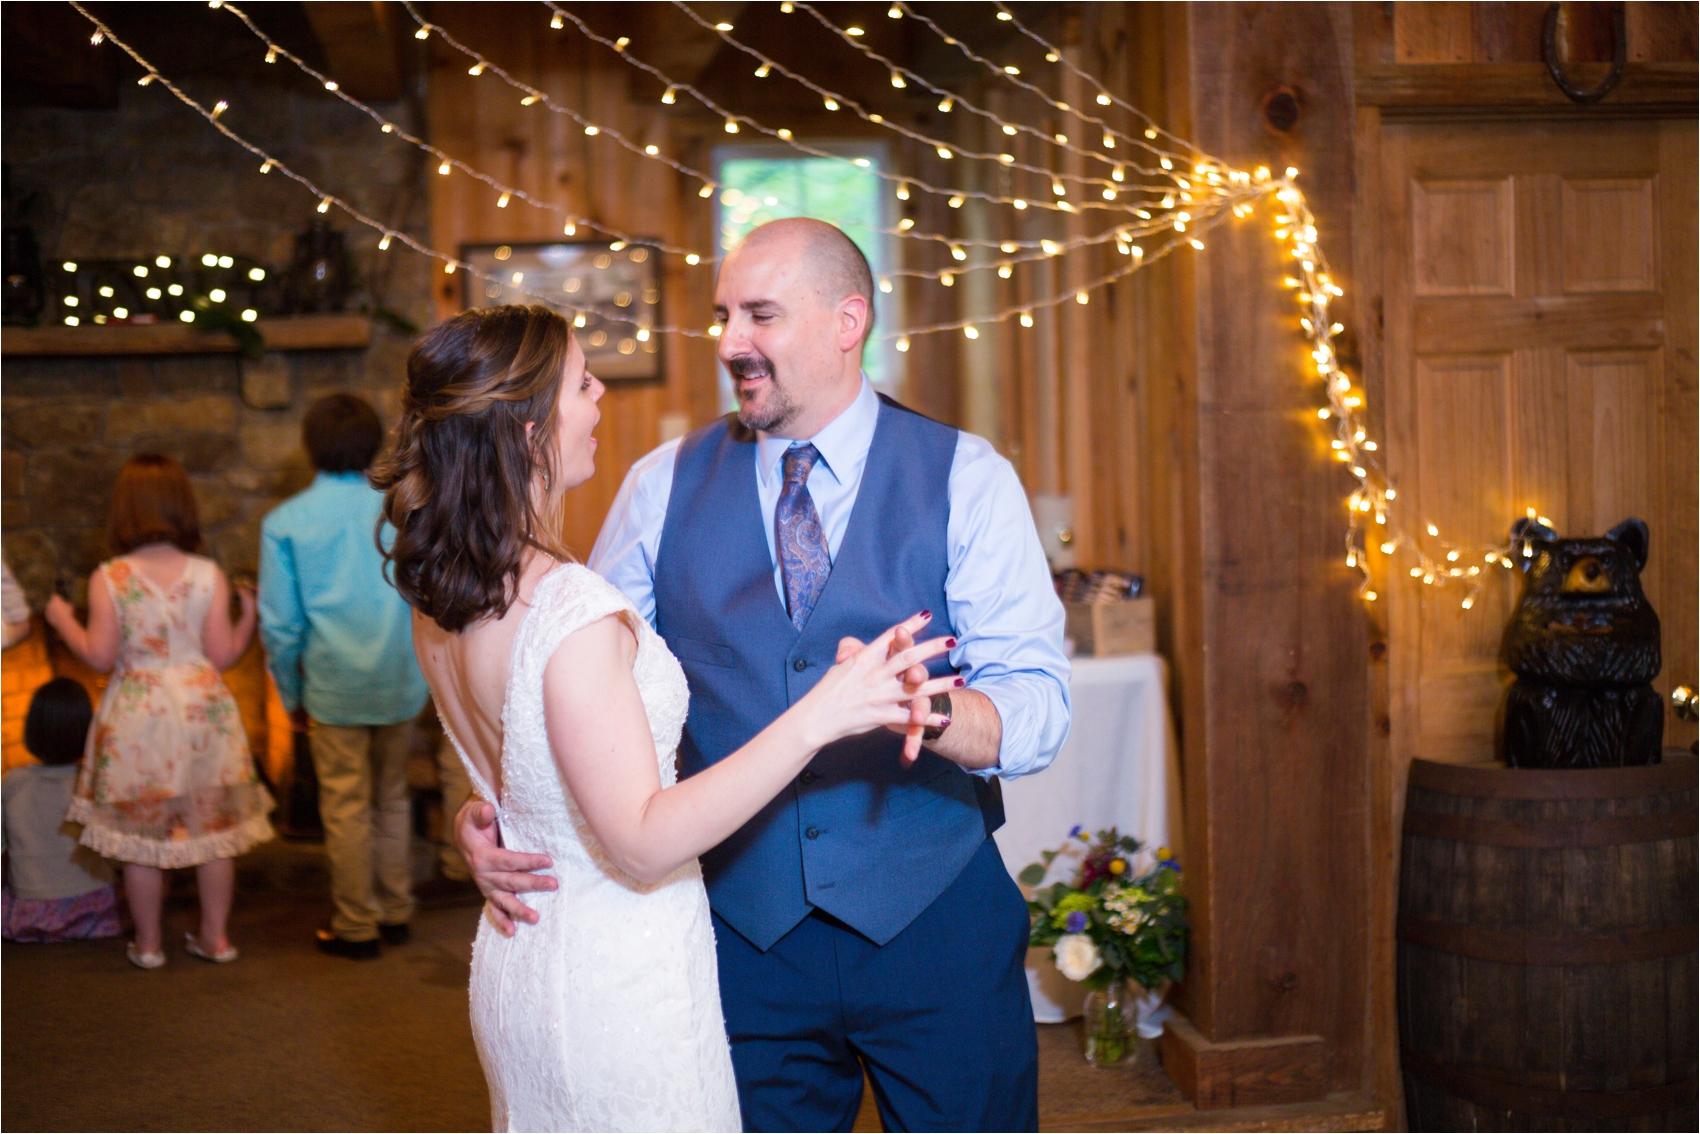 Lydia-Mountain-Spring-Virginia-Wedding-1085.jpg